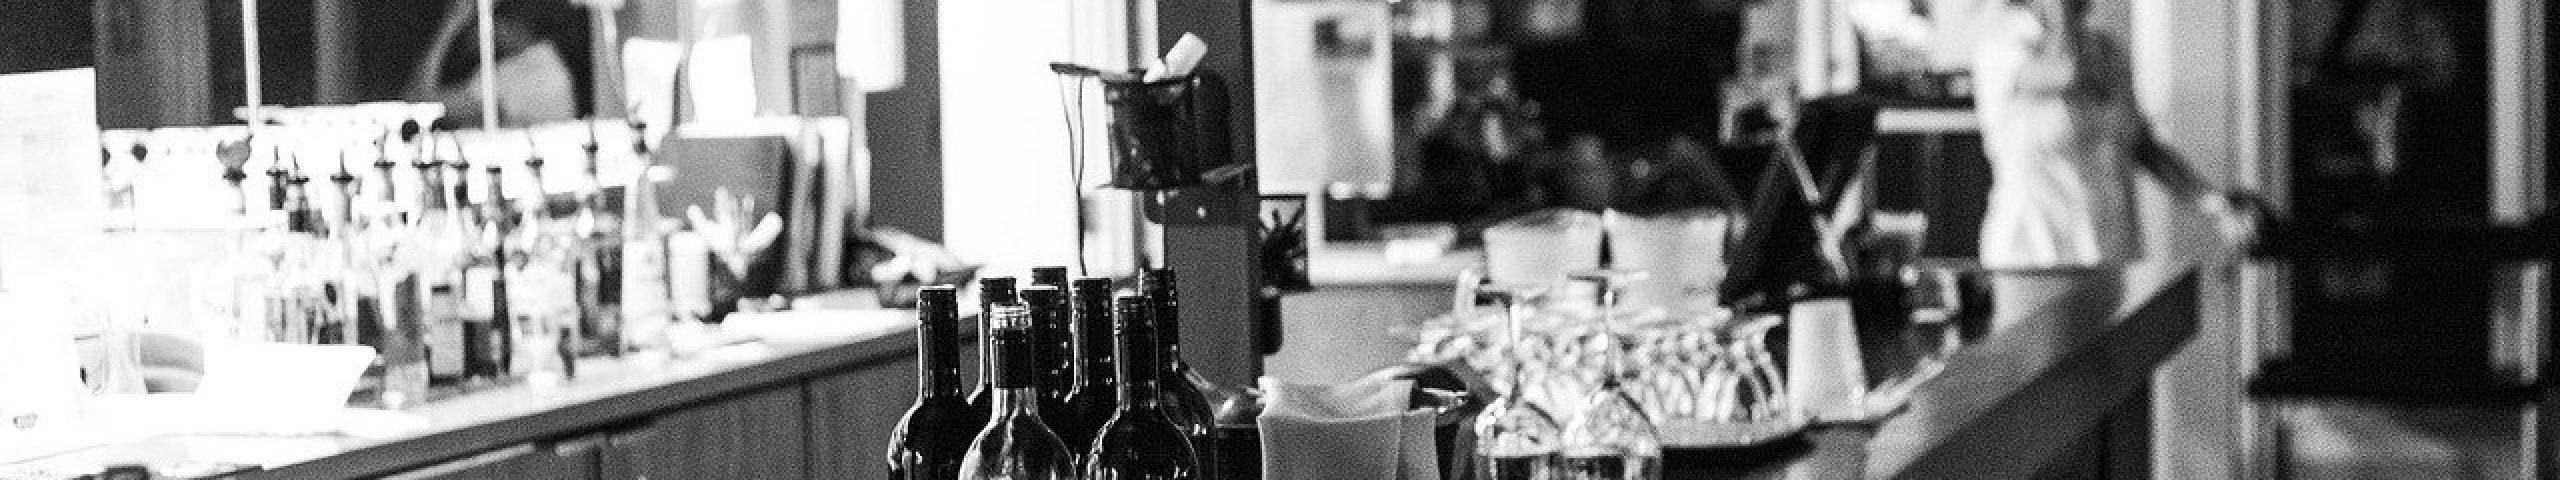 bar, alcohol, cocktail